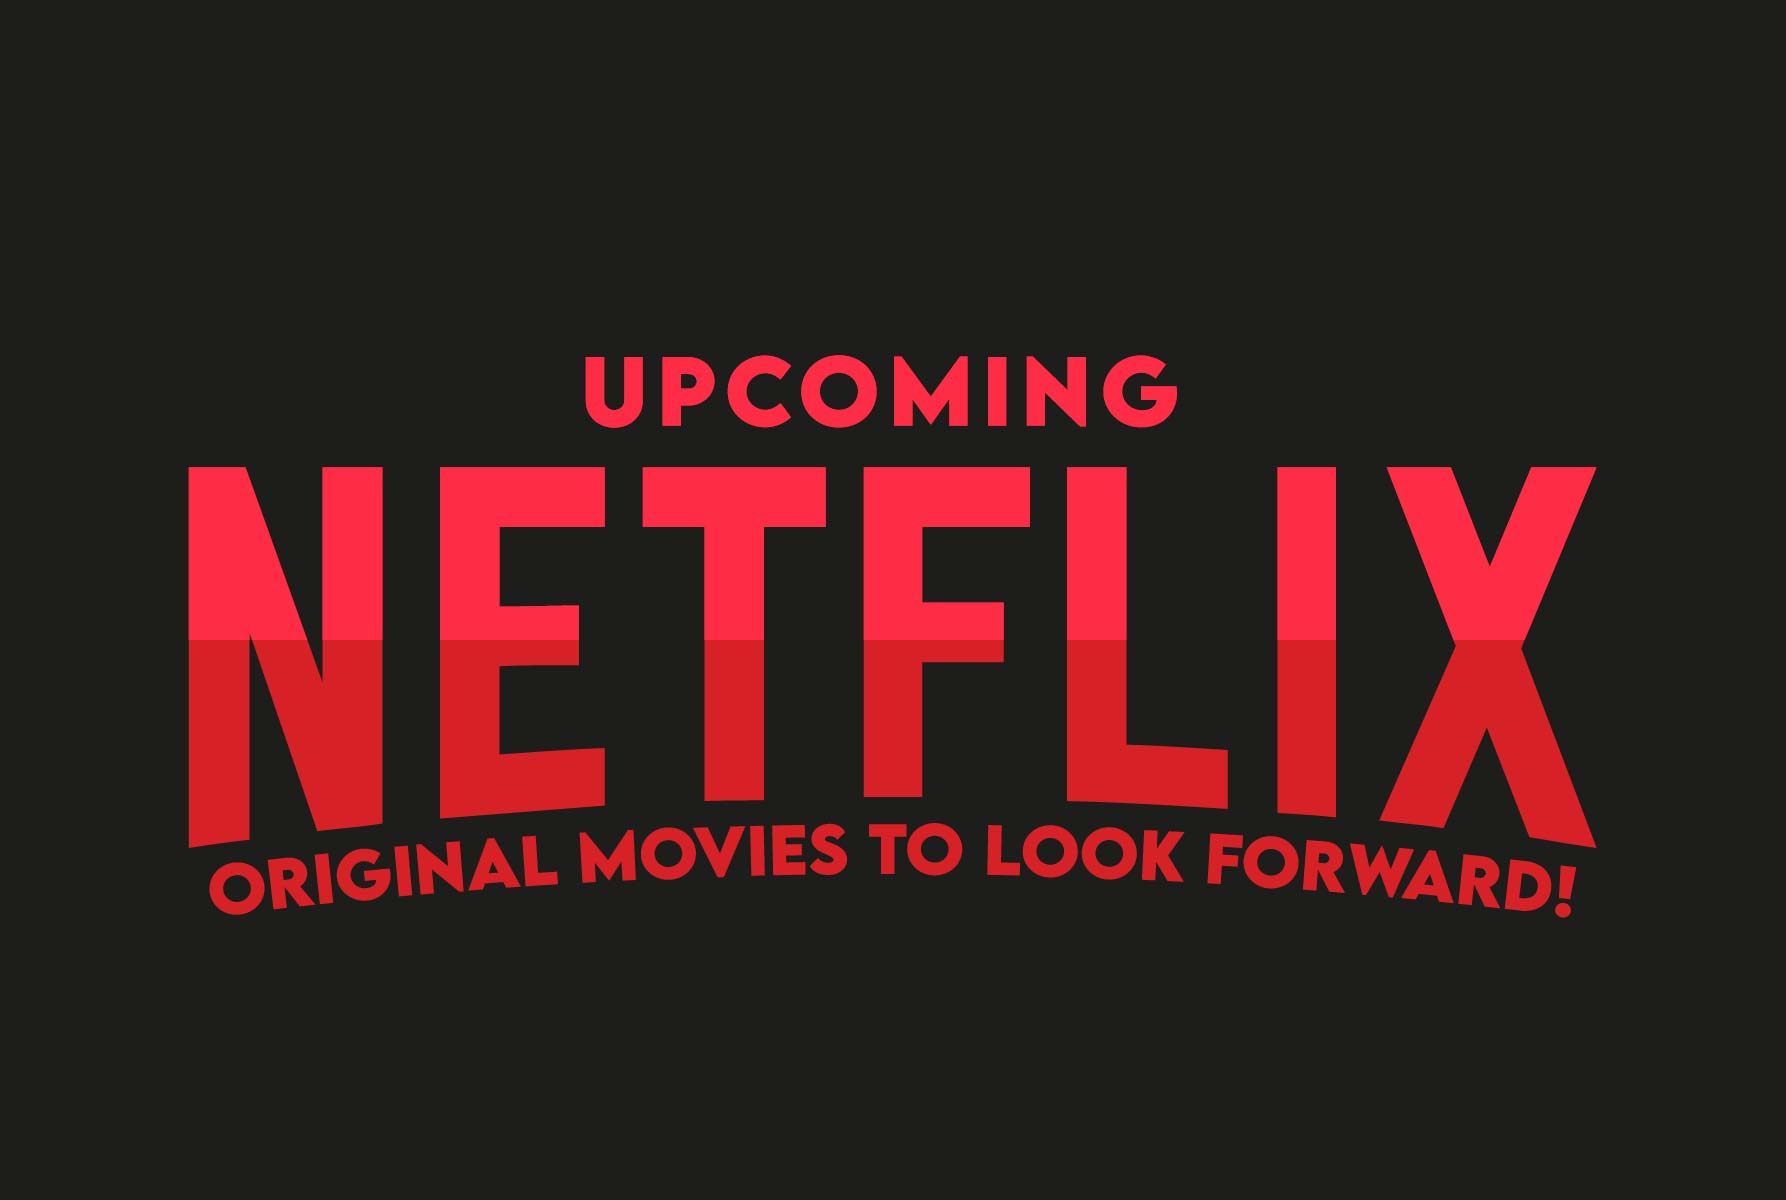 Upcoming Netflix original movies